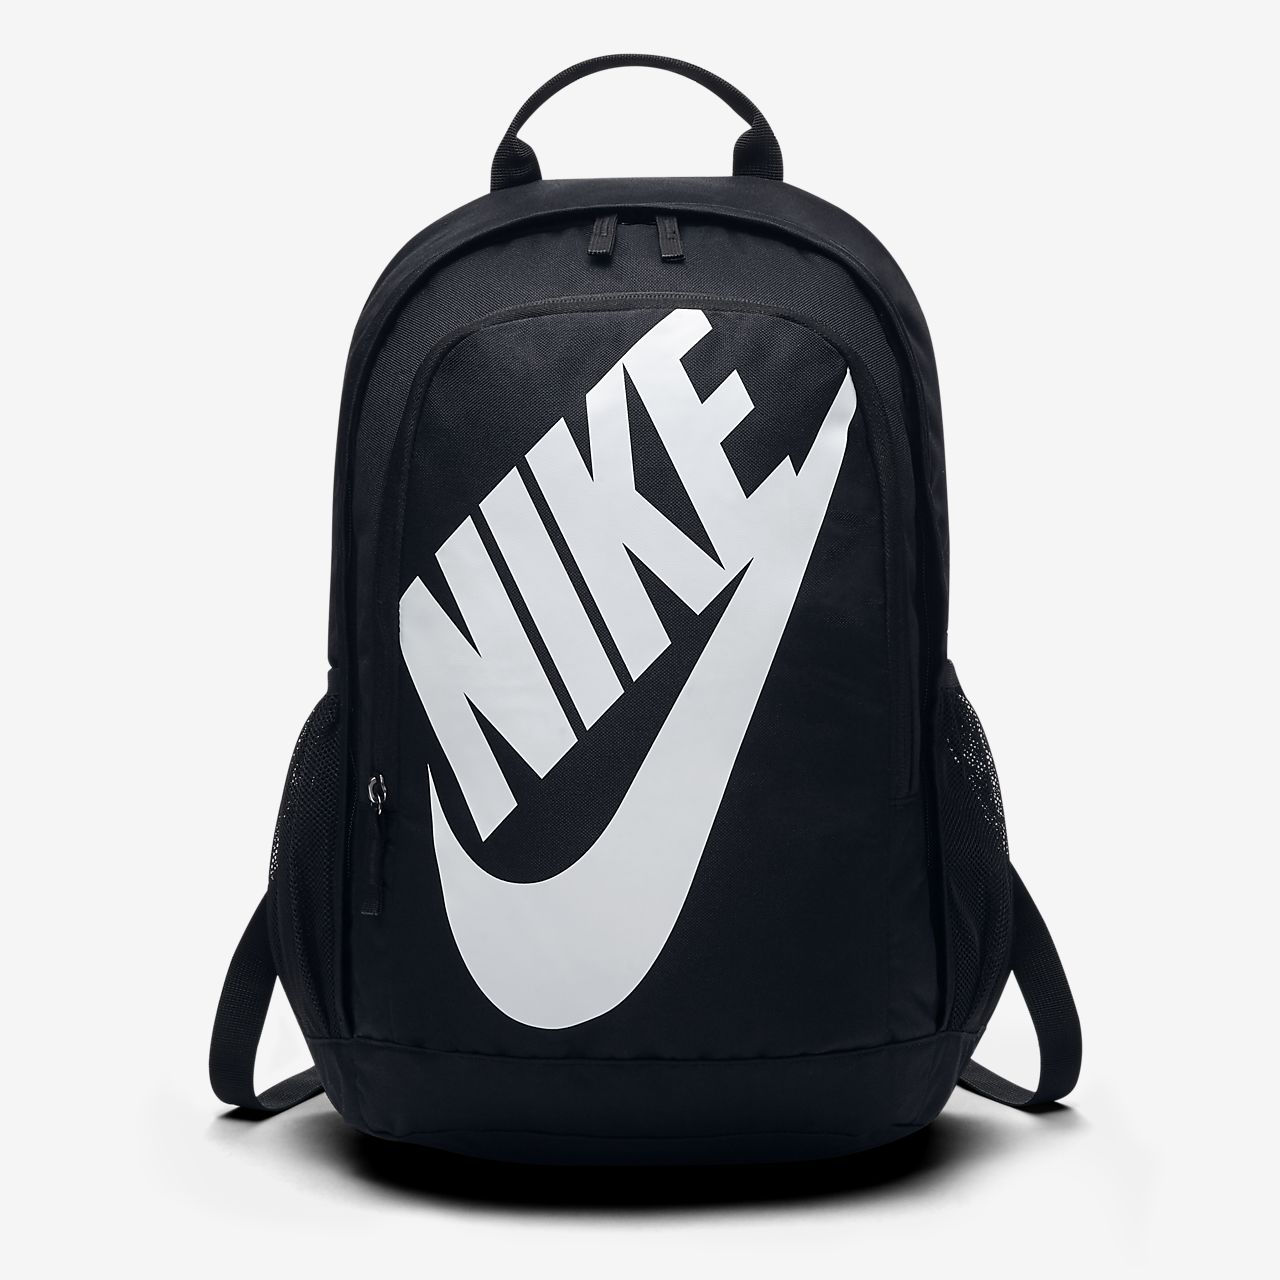 Hayward À 0 2 Dos Be Sportswear Nike Futura Sac nZ6xgqfdq